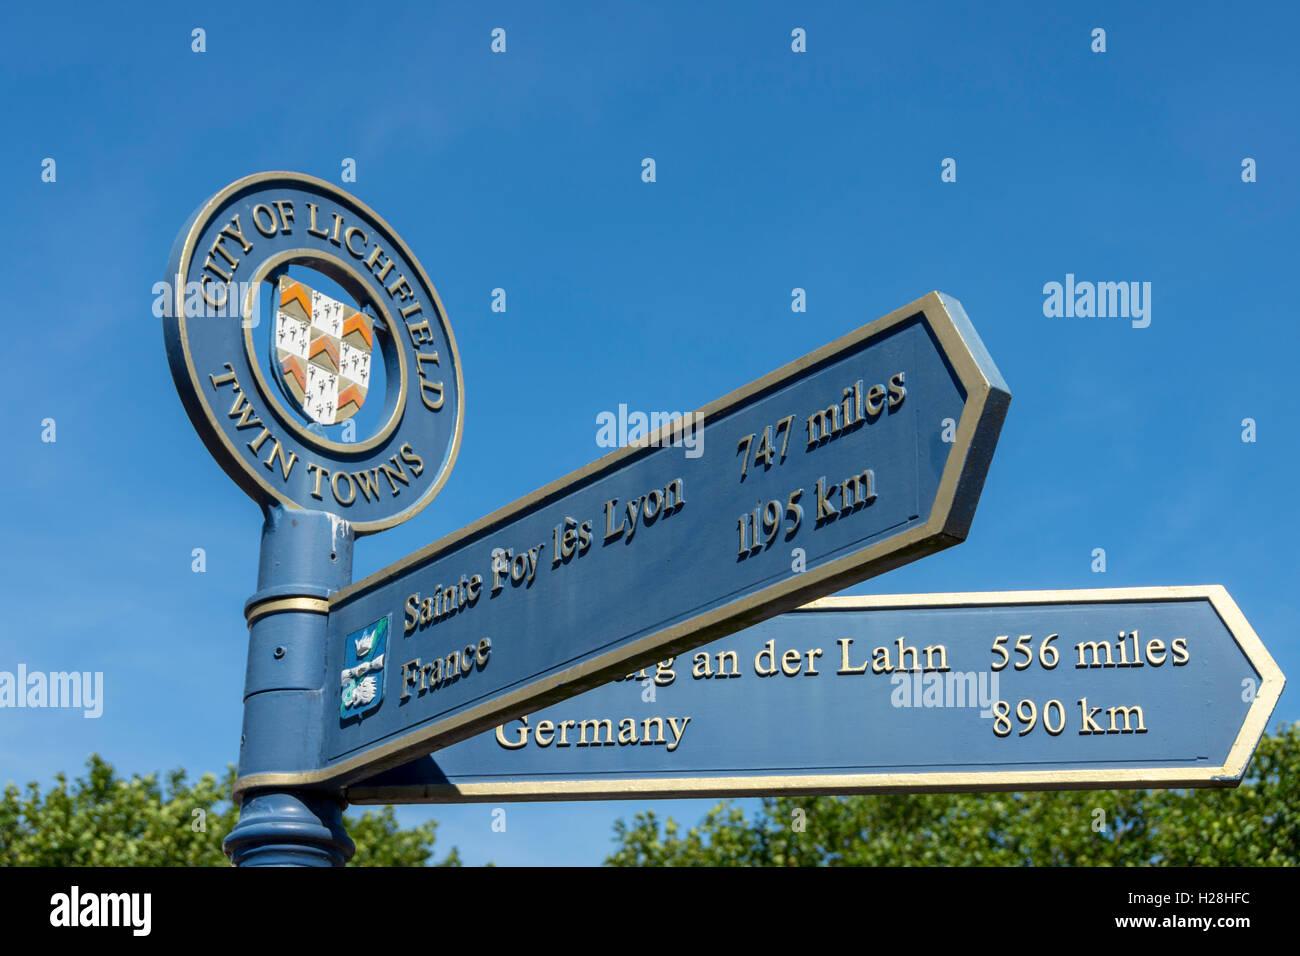 Signpost pointing to Lichfield's twin towns, St. John Street, Lichfield, Staffordshire, England, UK - Stock Image